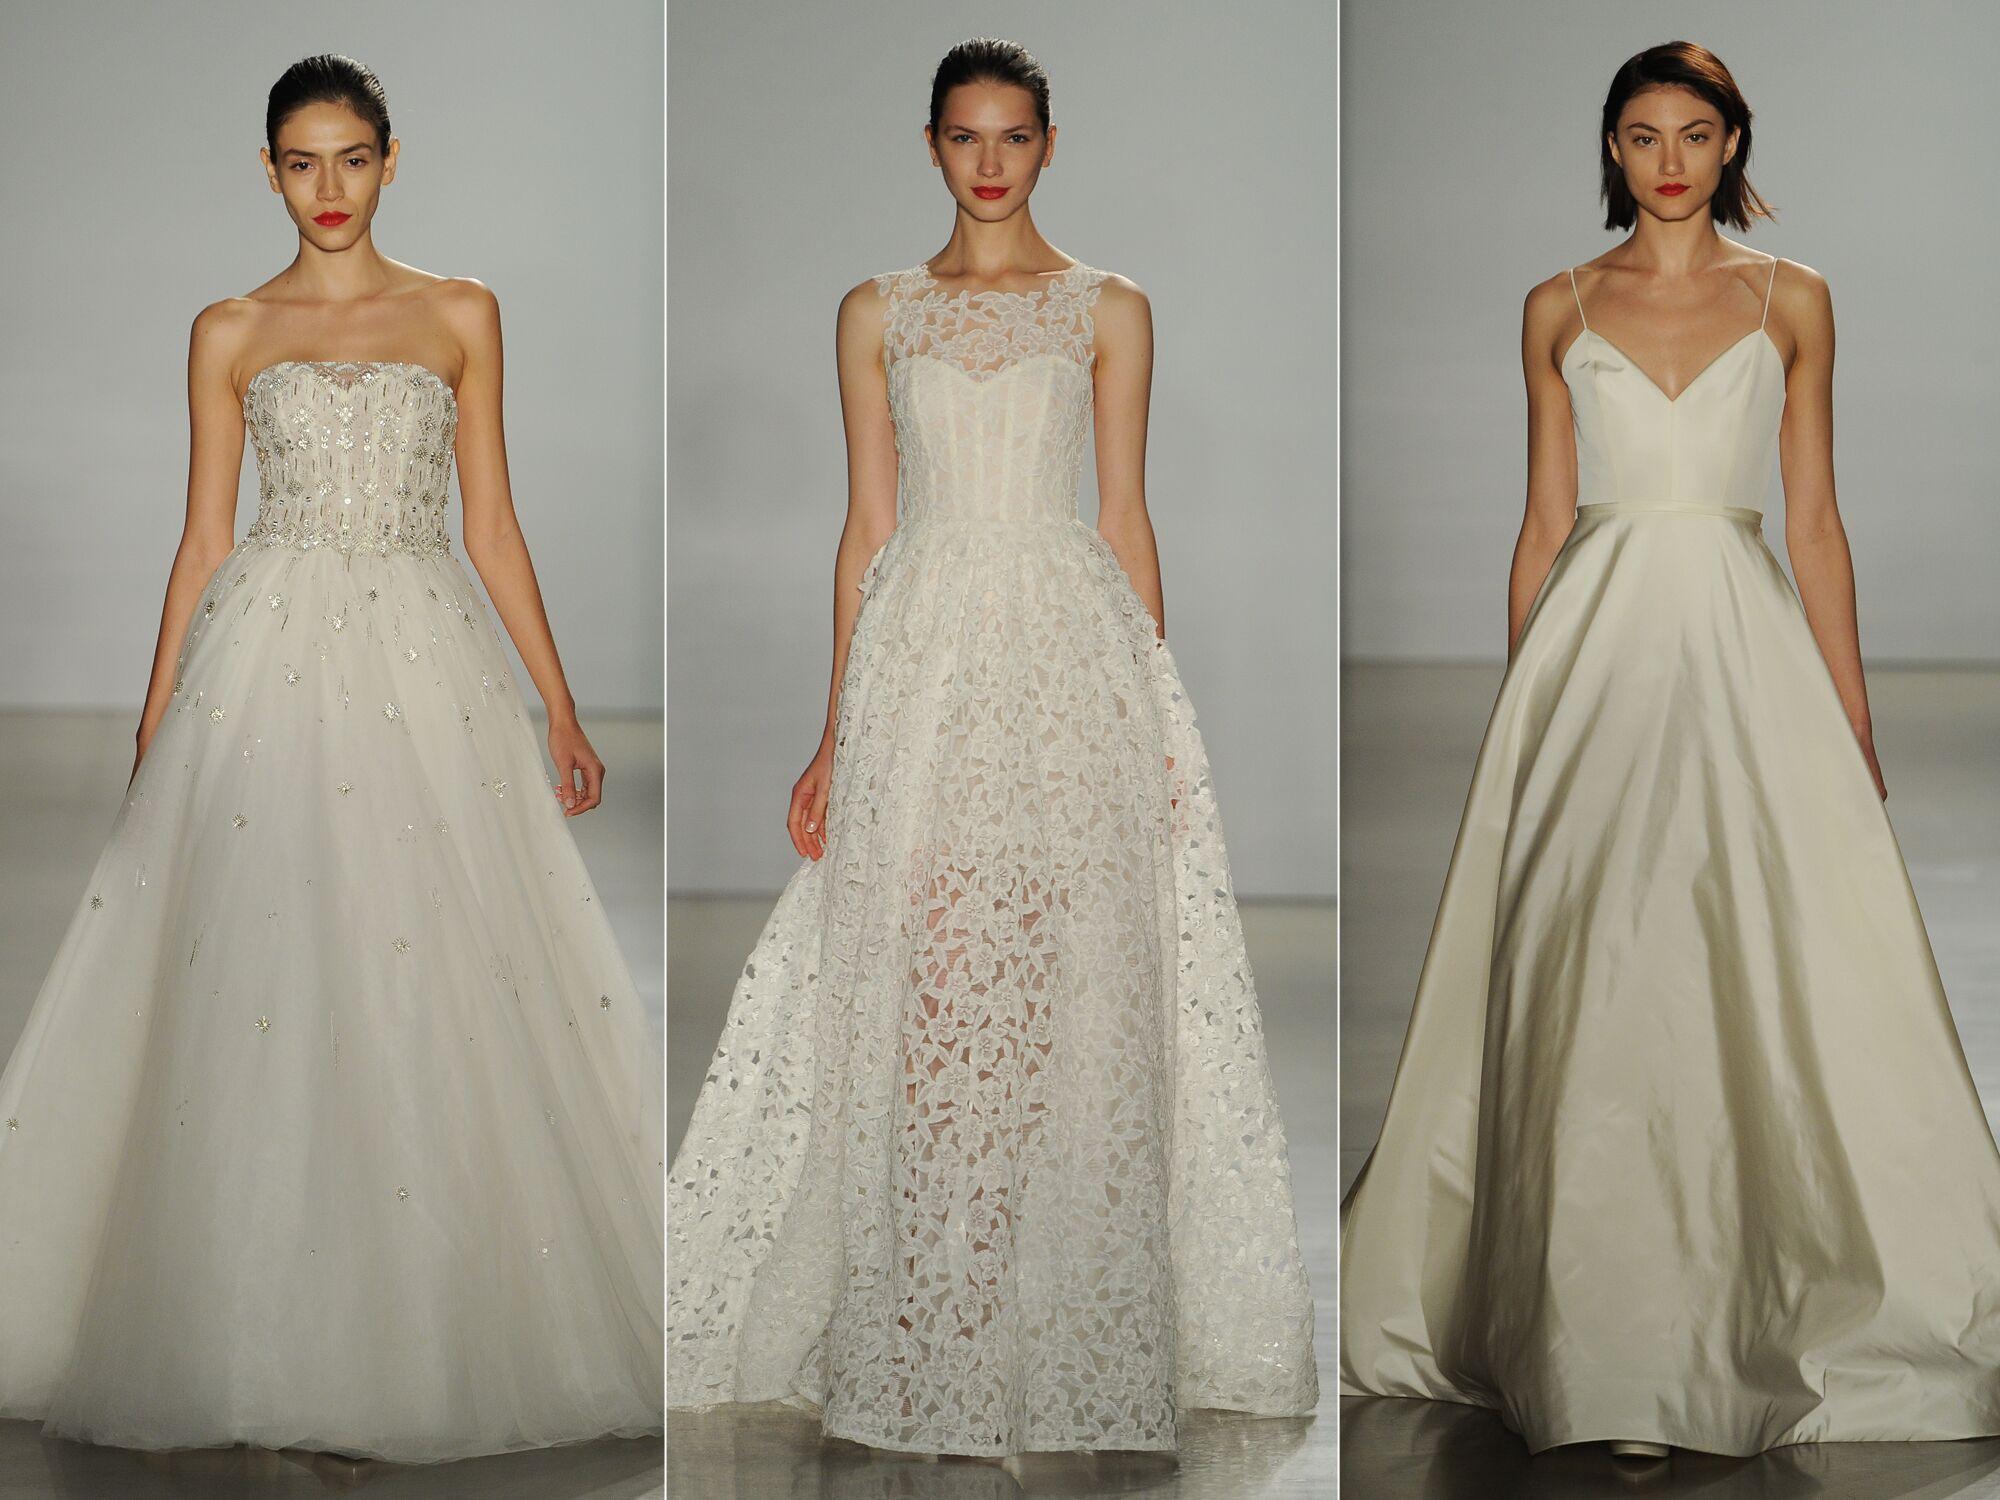 Amsale Fall 2016 Collection: Wedding Dress Photos